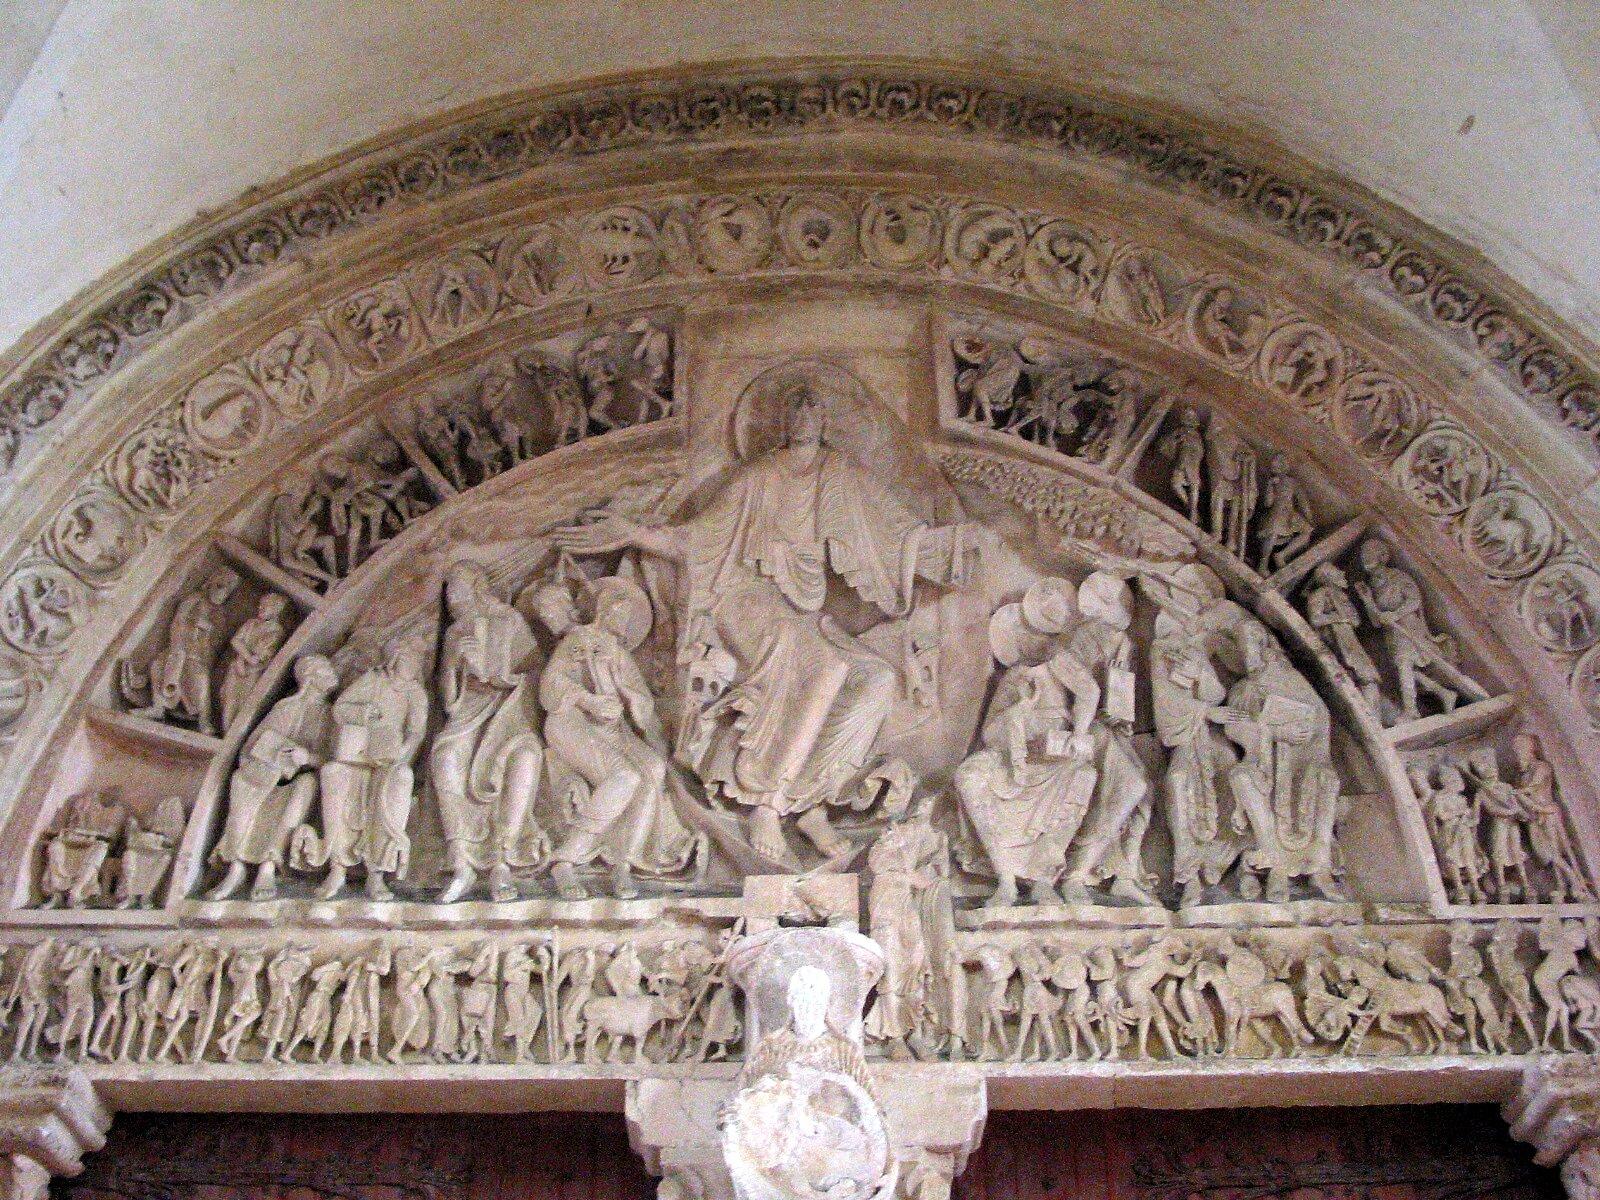 Tympanon zkościoła wVazley Źródło: Jean-Pol GRANDMONT Grandmont, Tympanon zkościoła wVazley, licencja: CC BY-SA 3.0.